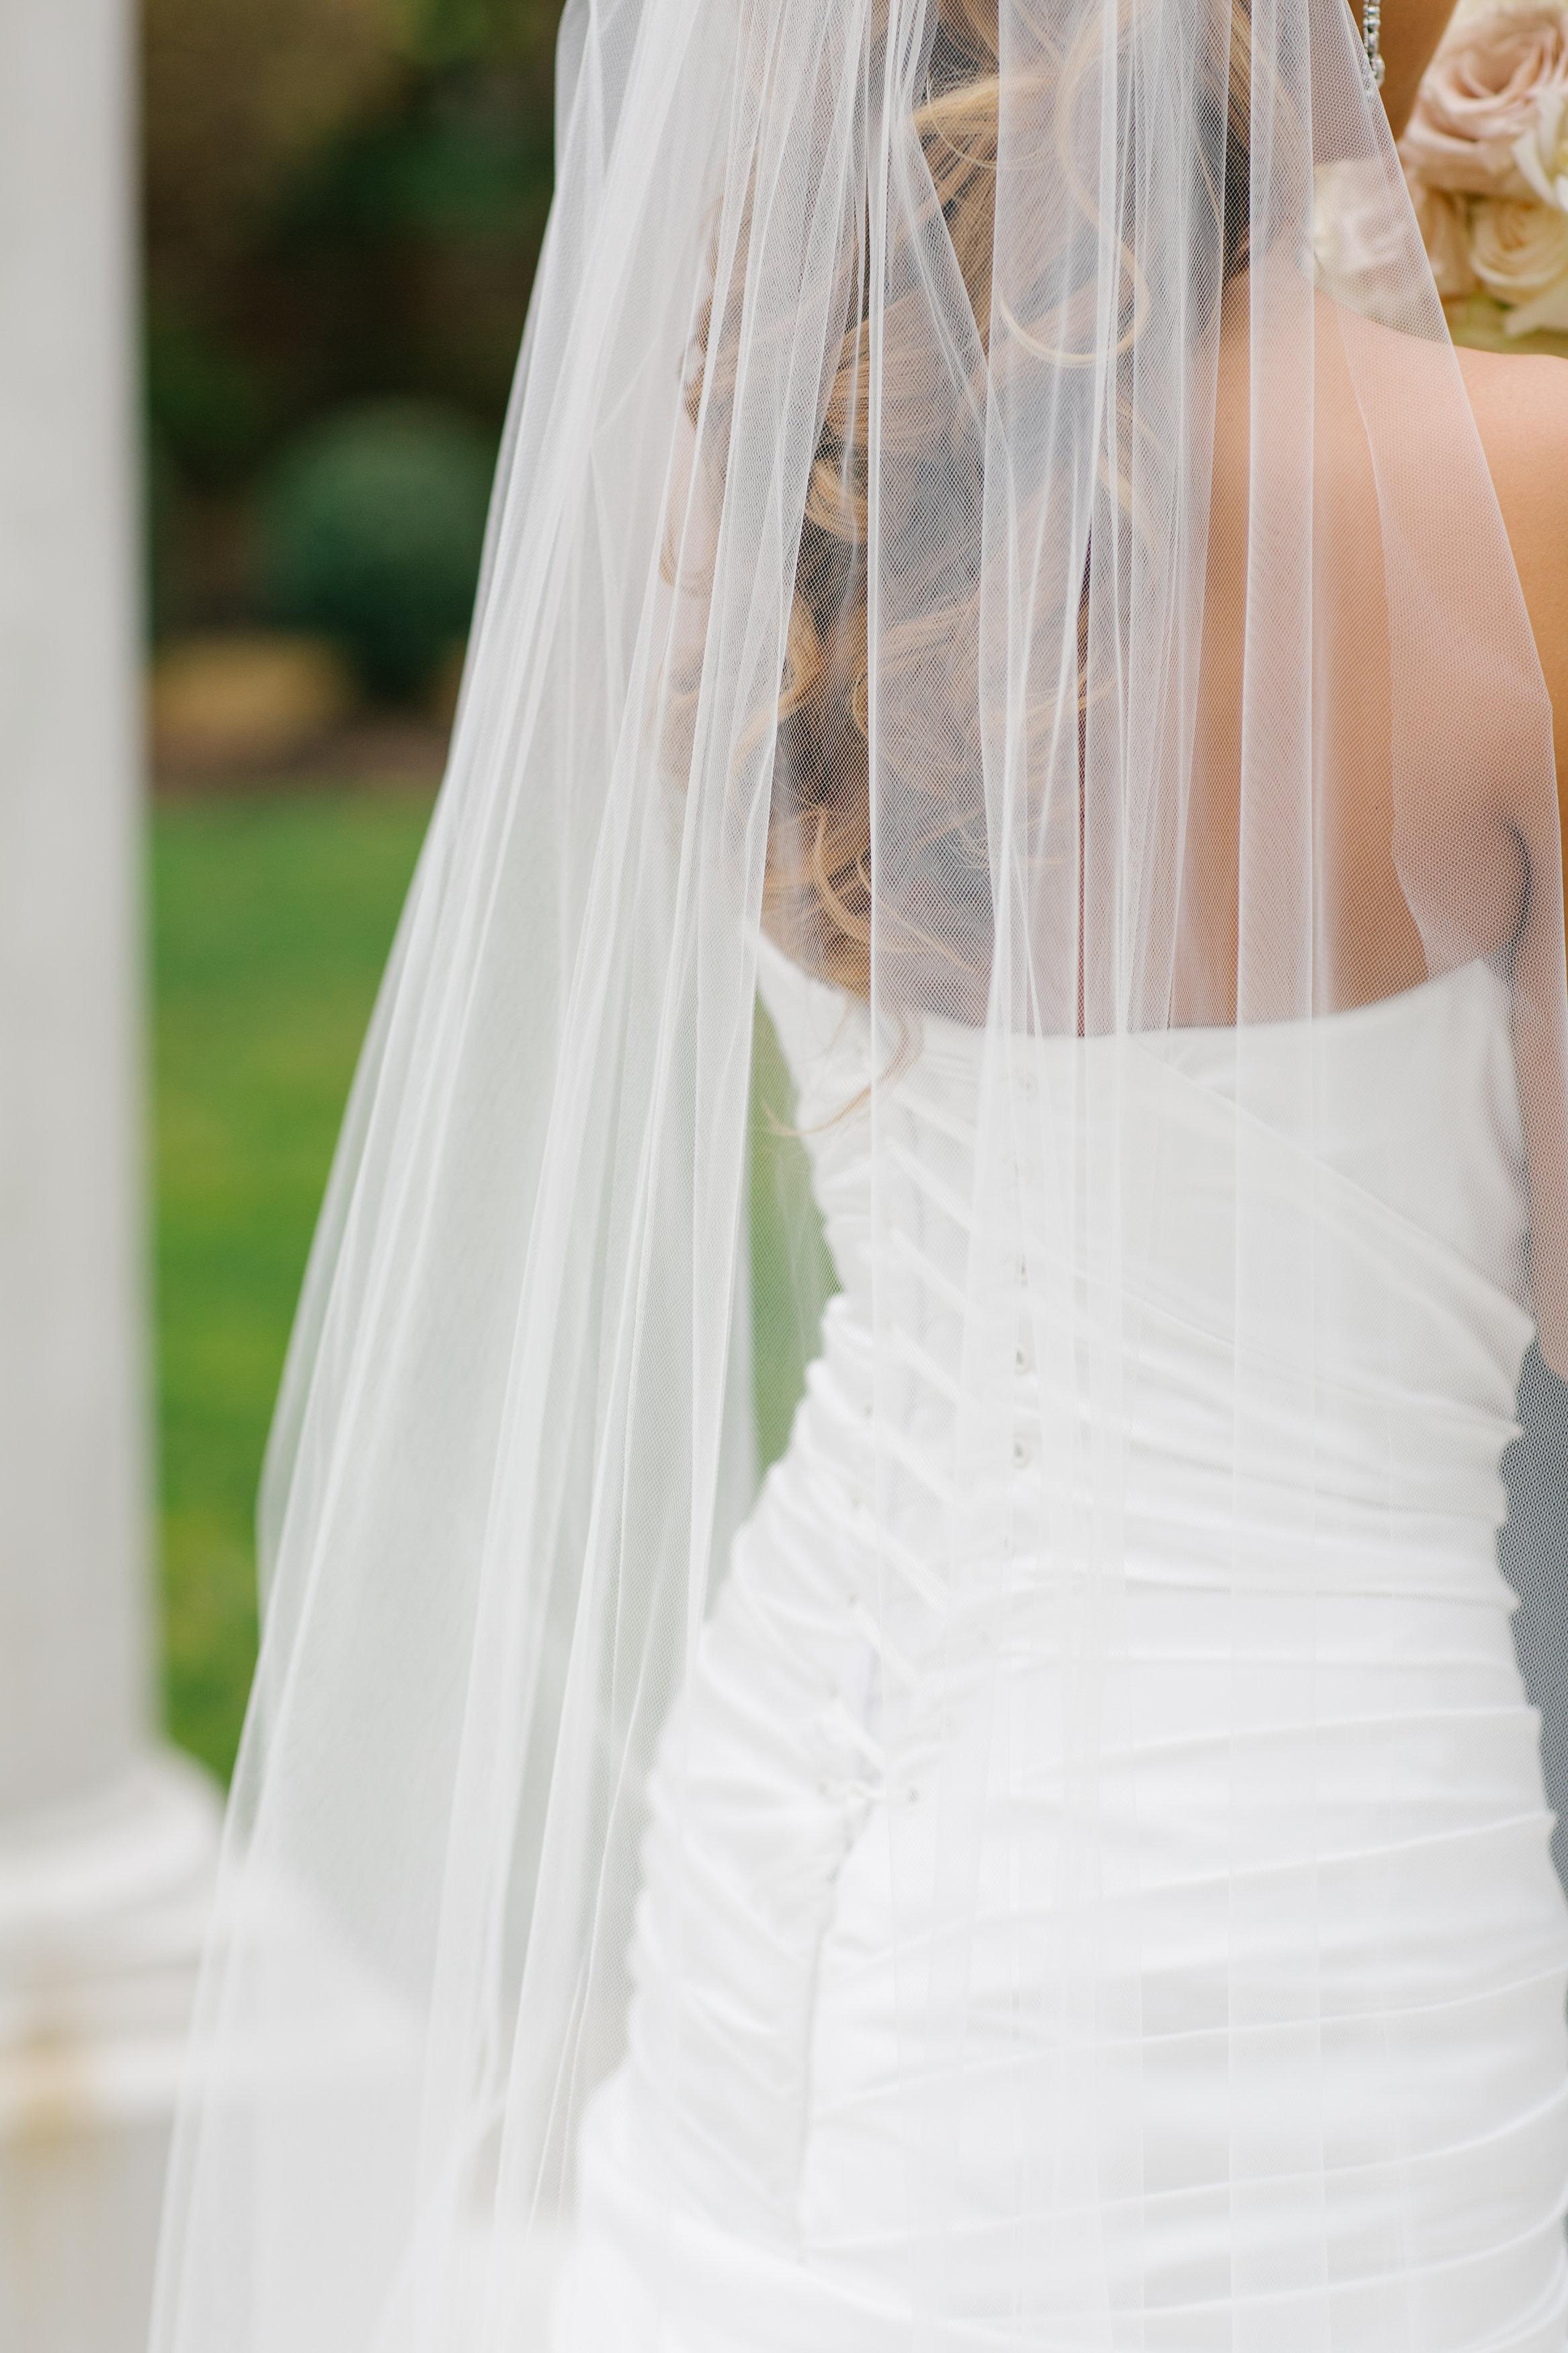 Ceci_New_York_Custom_Invitation_ New_Jersey_Wedding_Luxury_Personalized_Ceci_Style_Bride_Foil_Stamping16.jpg